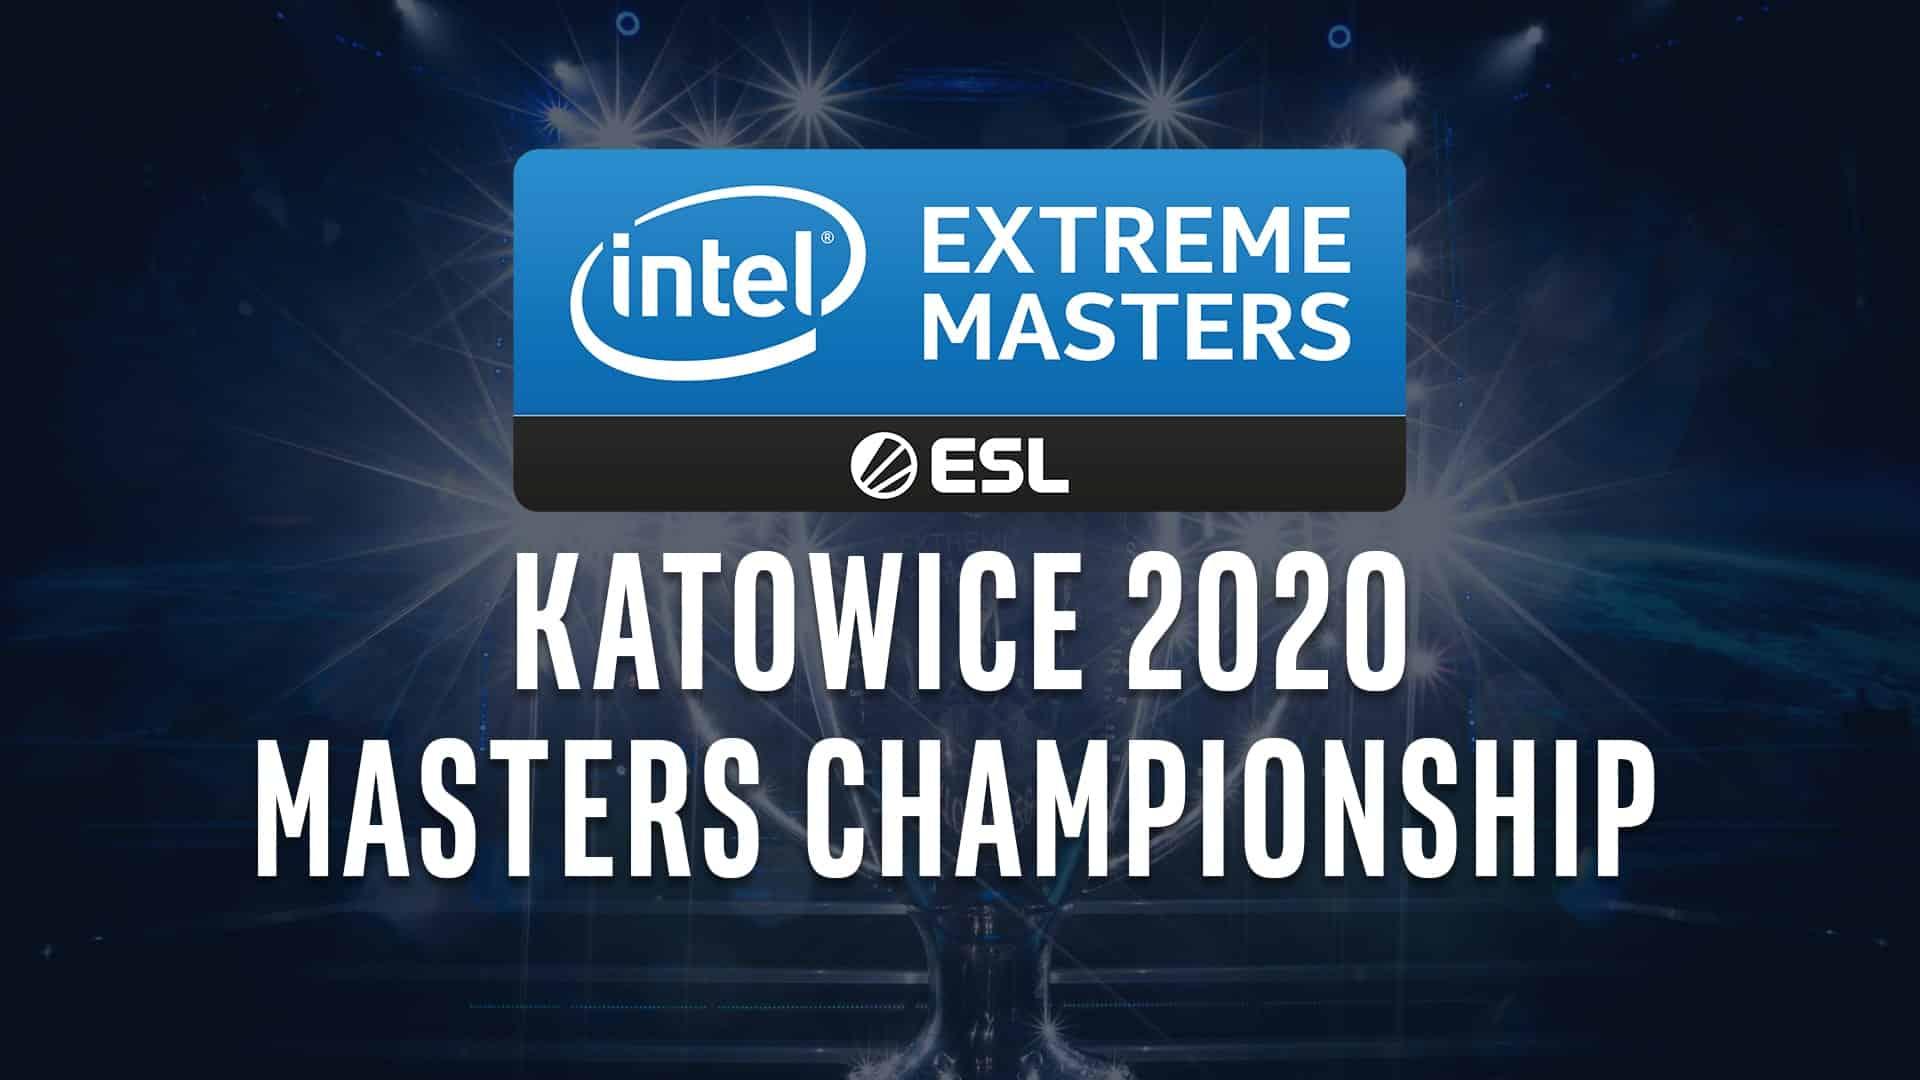 IEM Katowice 2020